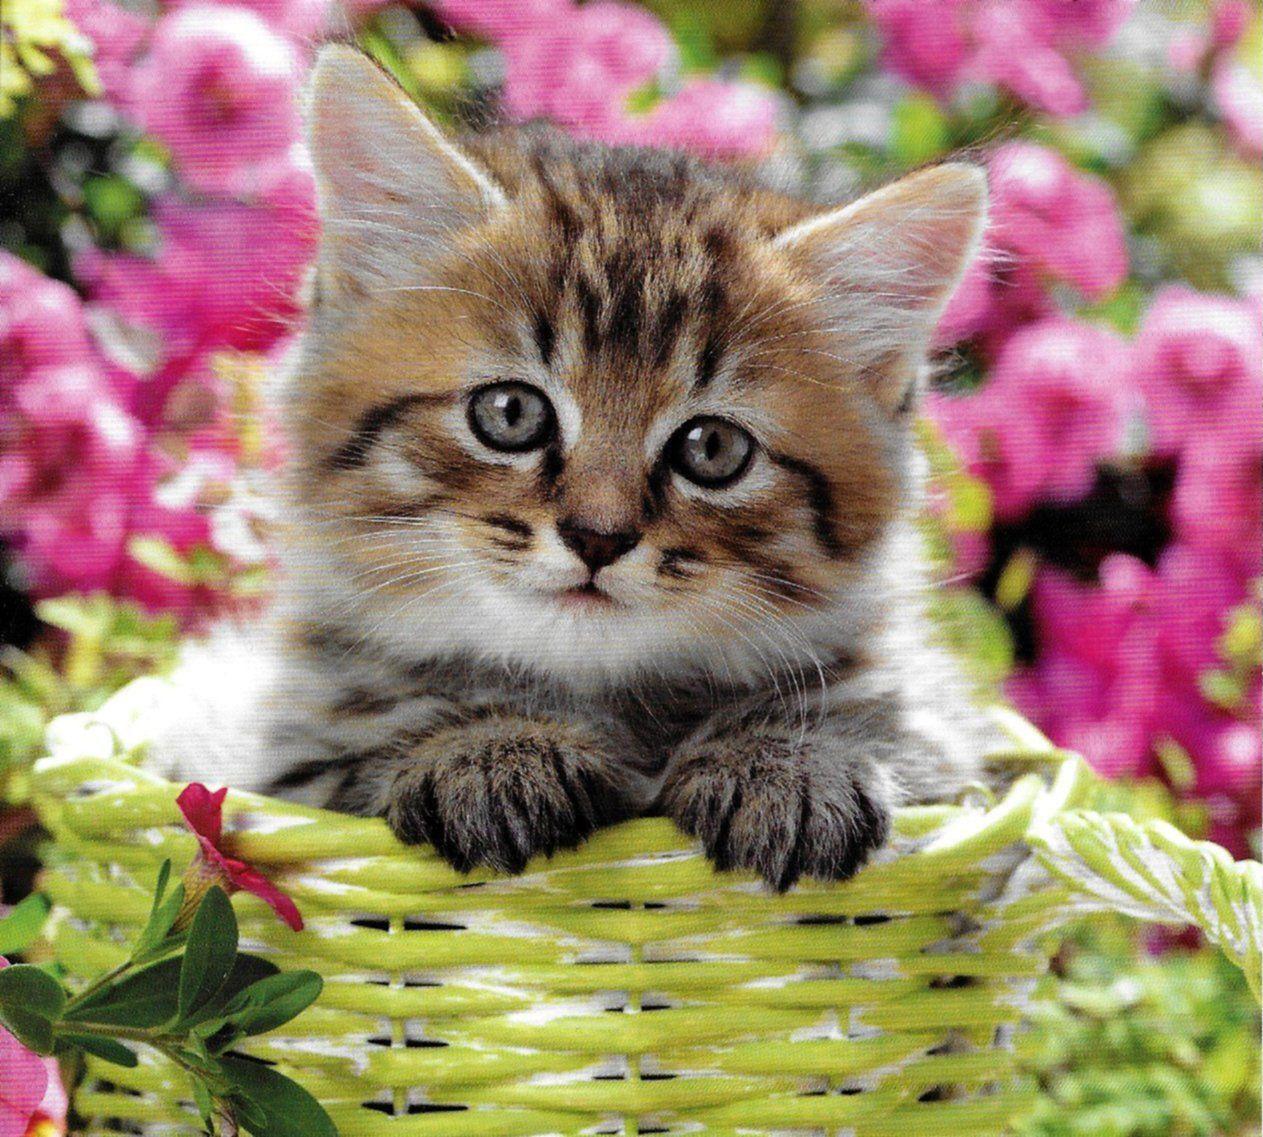 cute little fluffy tabby kitten aww �� cute fluffy